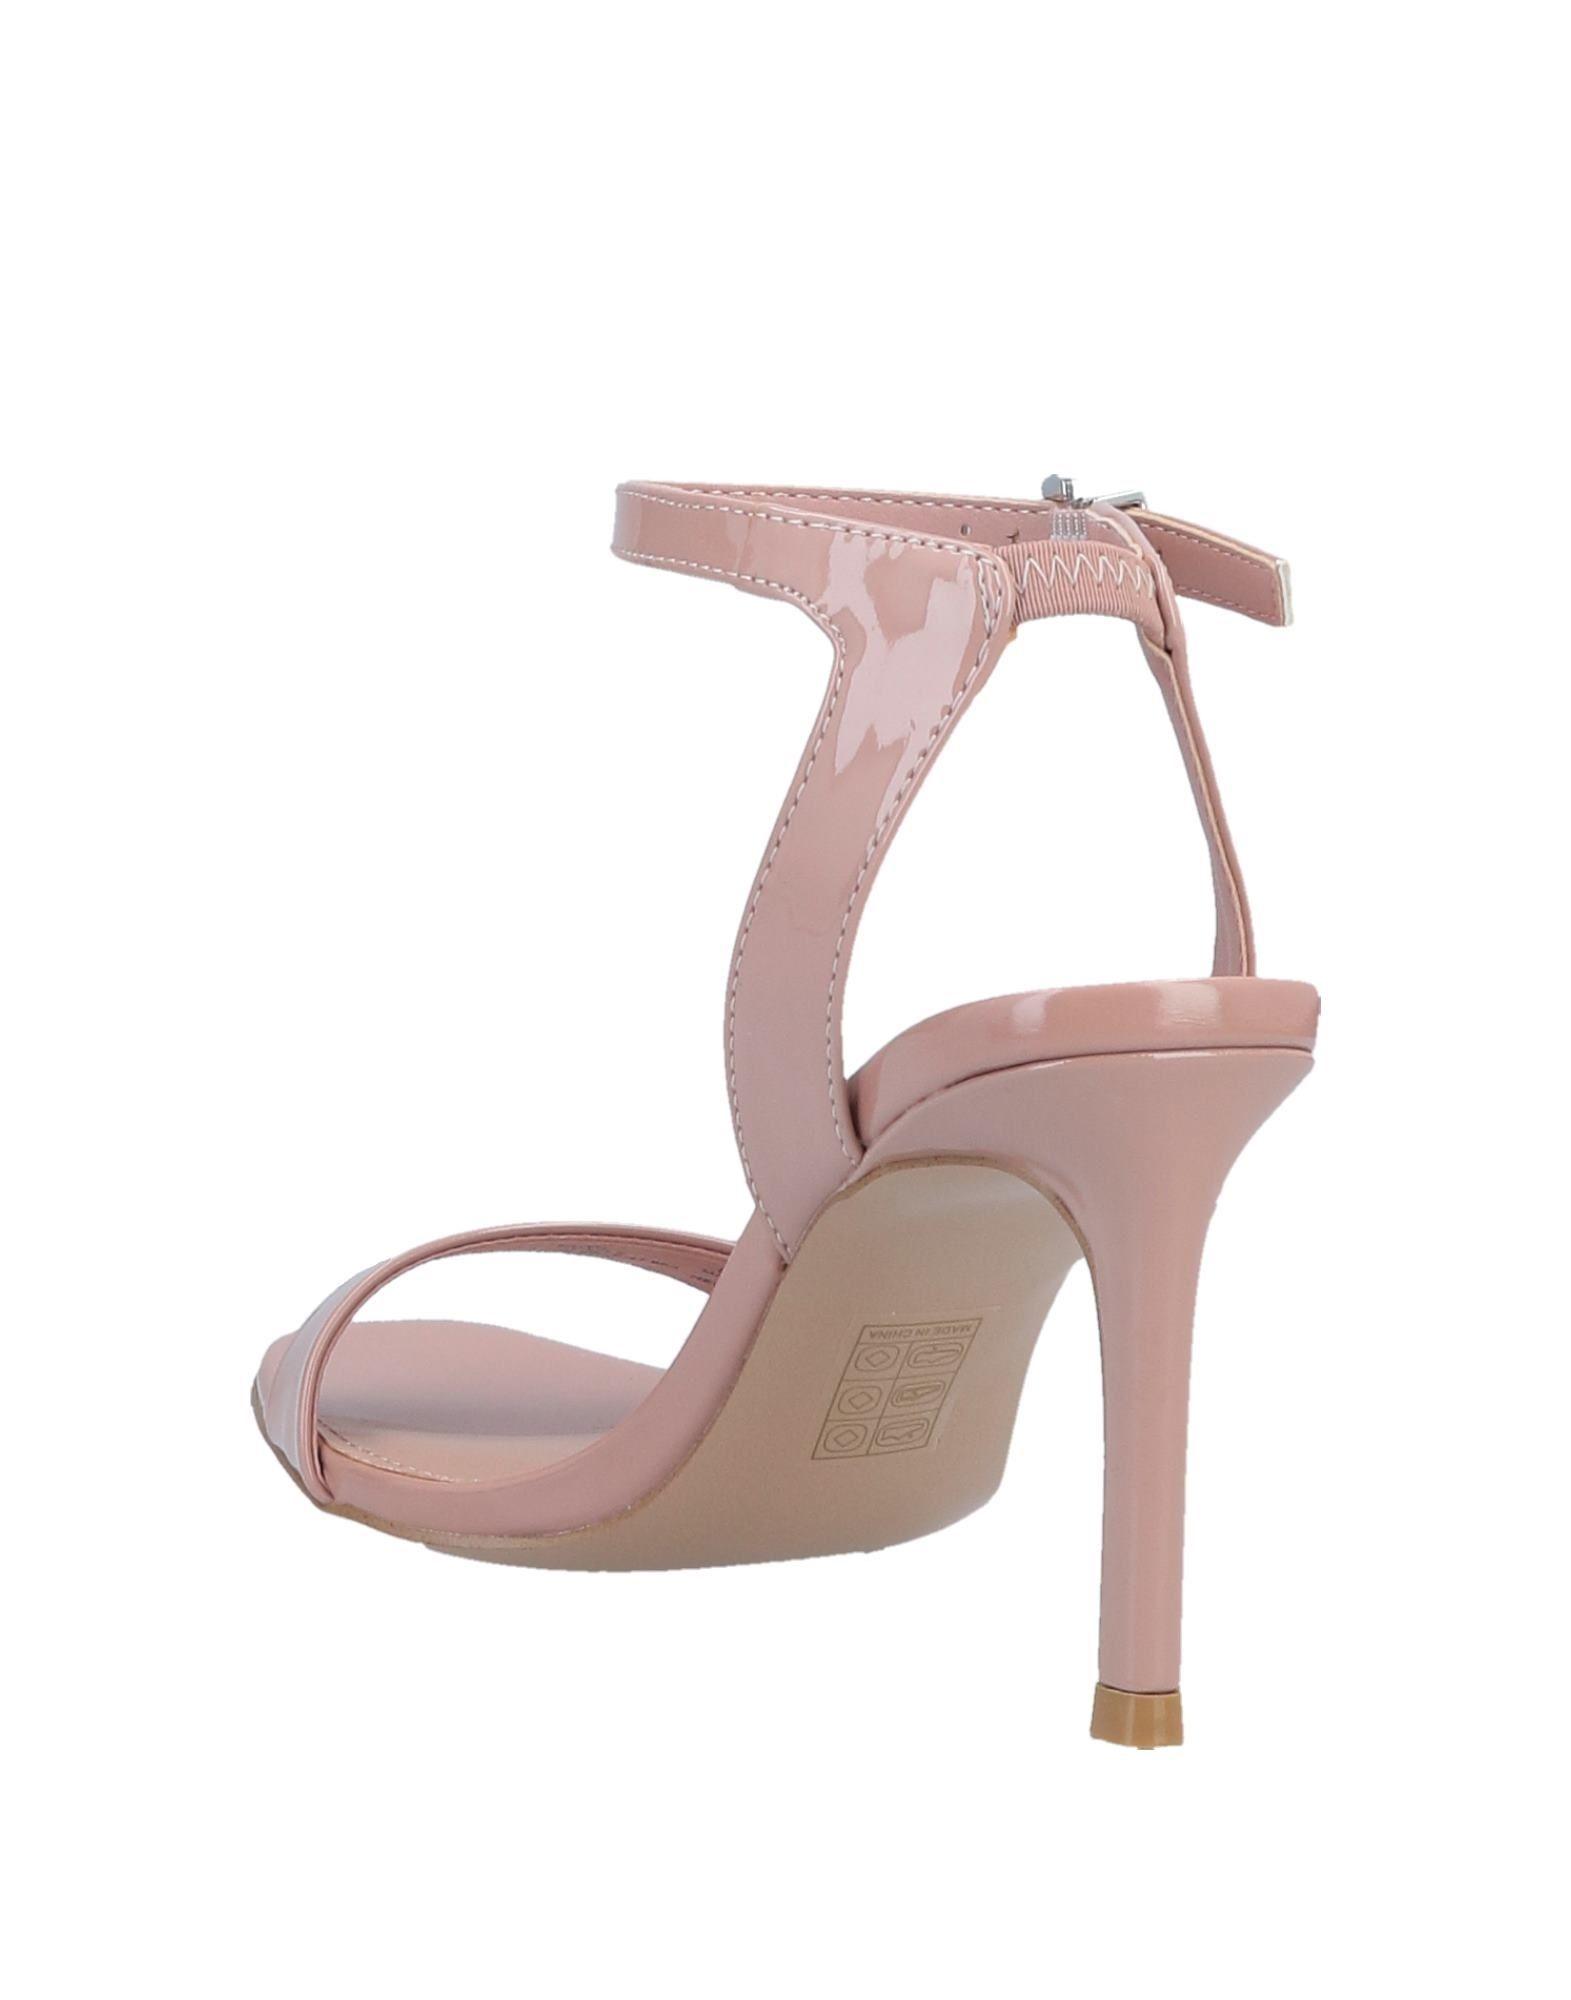 Steve Madden Pale Pink Leather Heeled Sandals